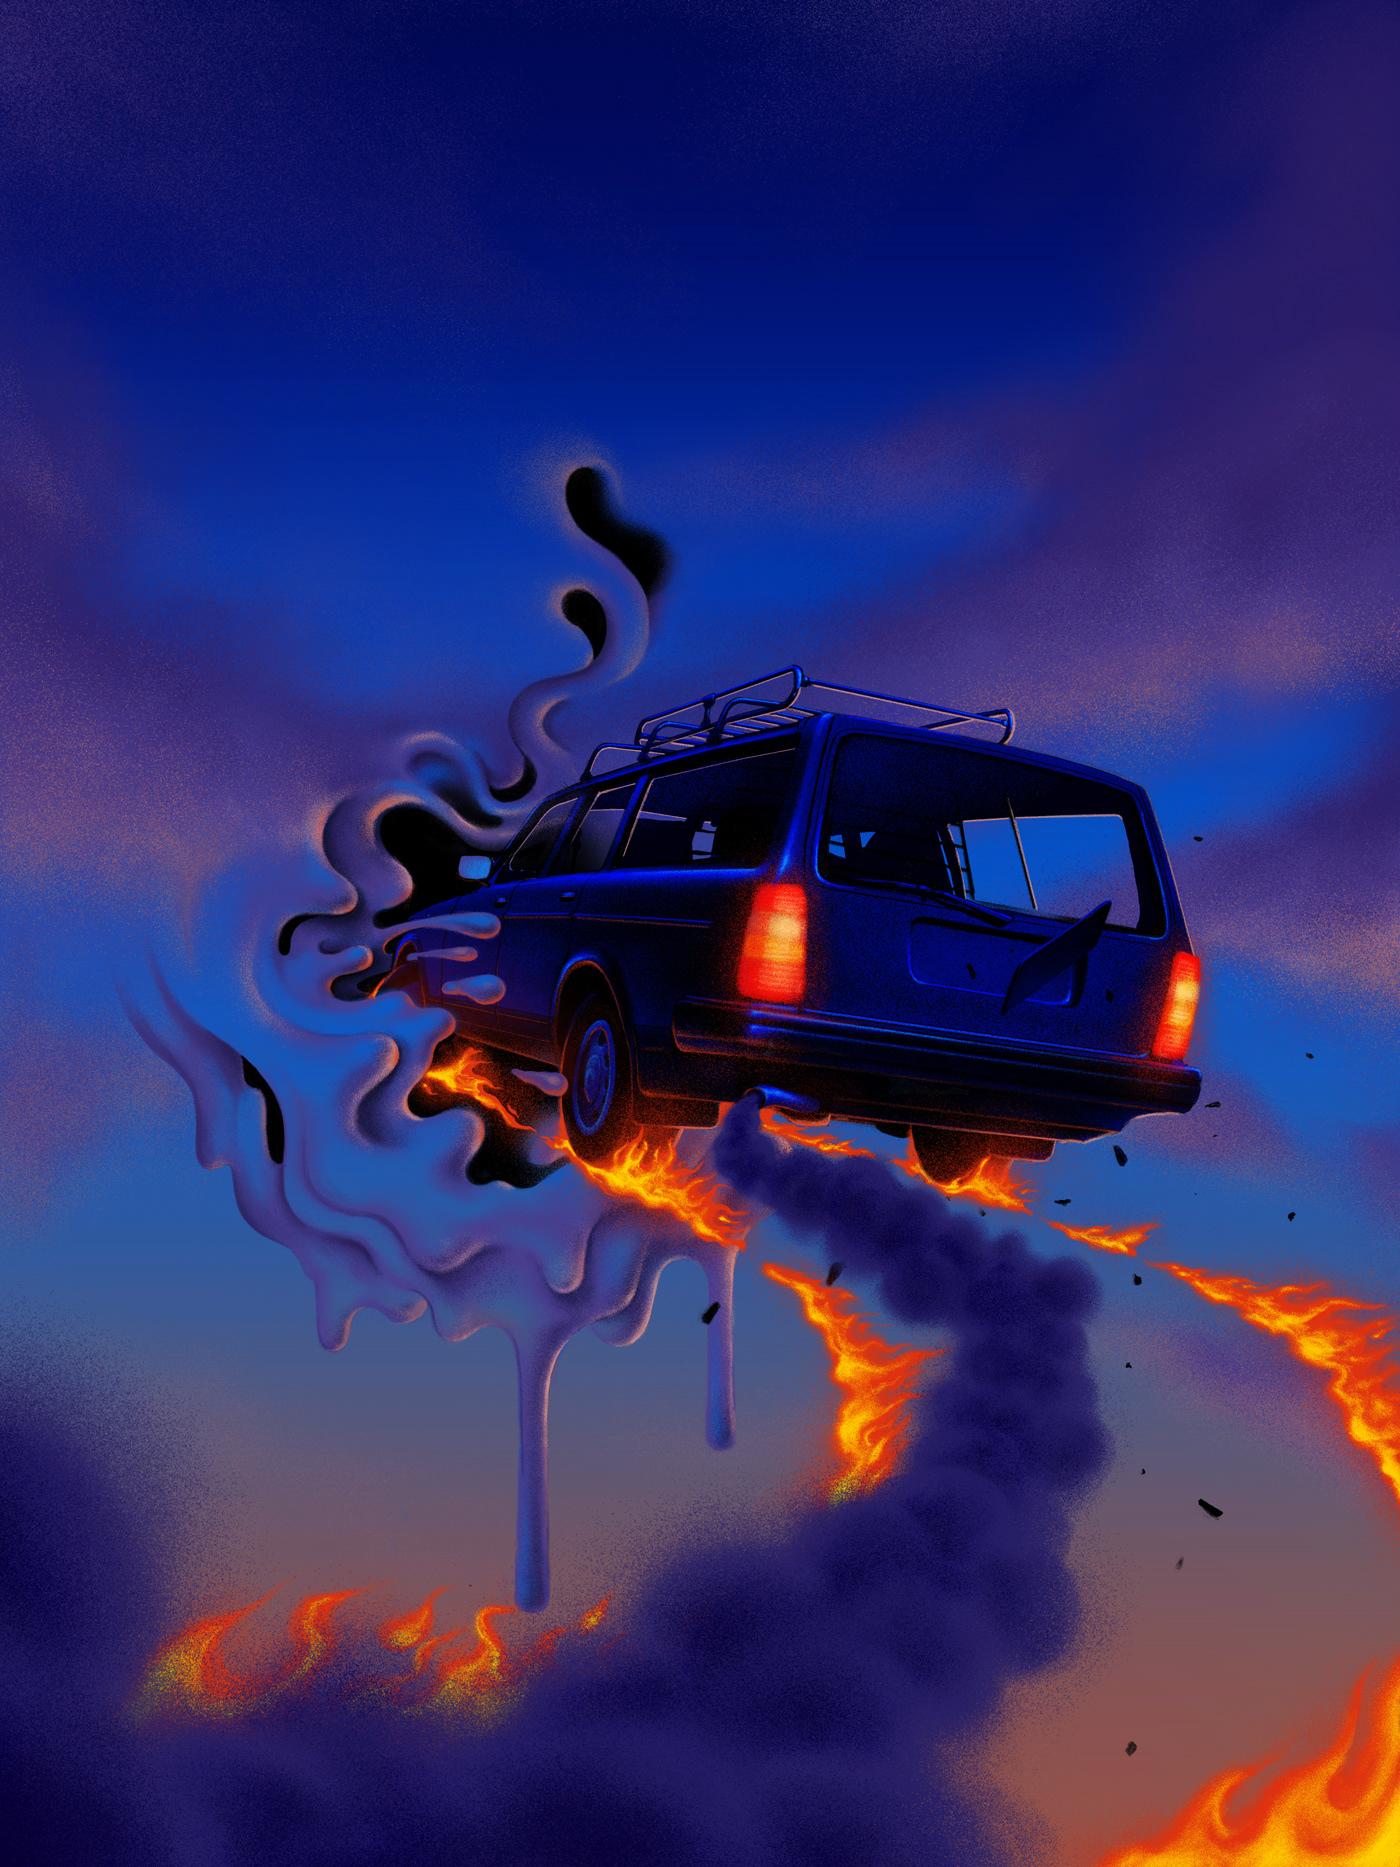 airbrush animation  artwork concept art Digital Art  digital illustration ILLUSTRATION  motion graphics  Scifi surreal